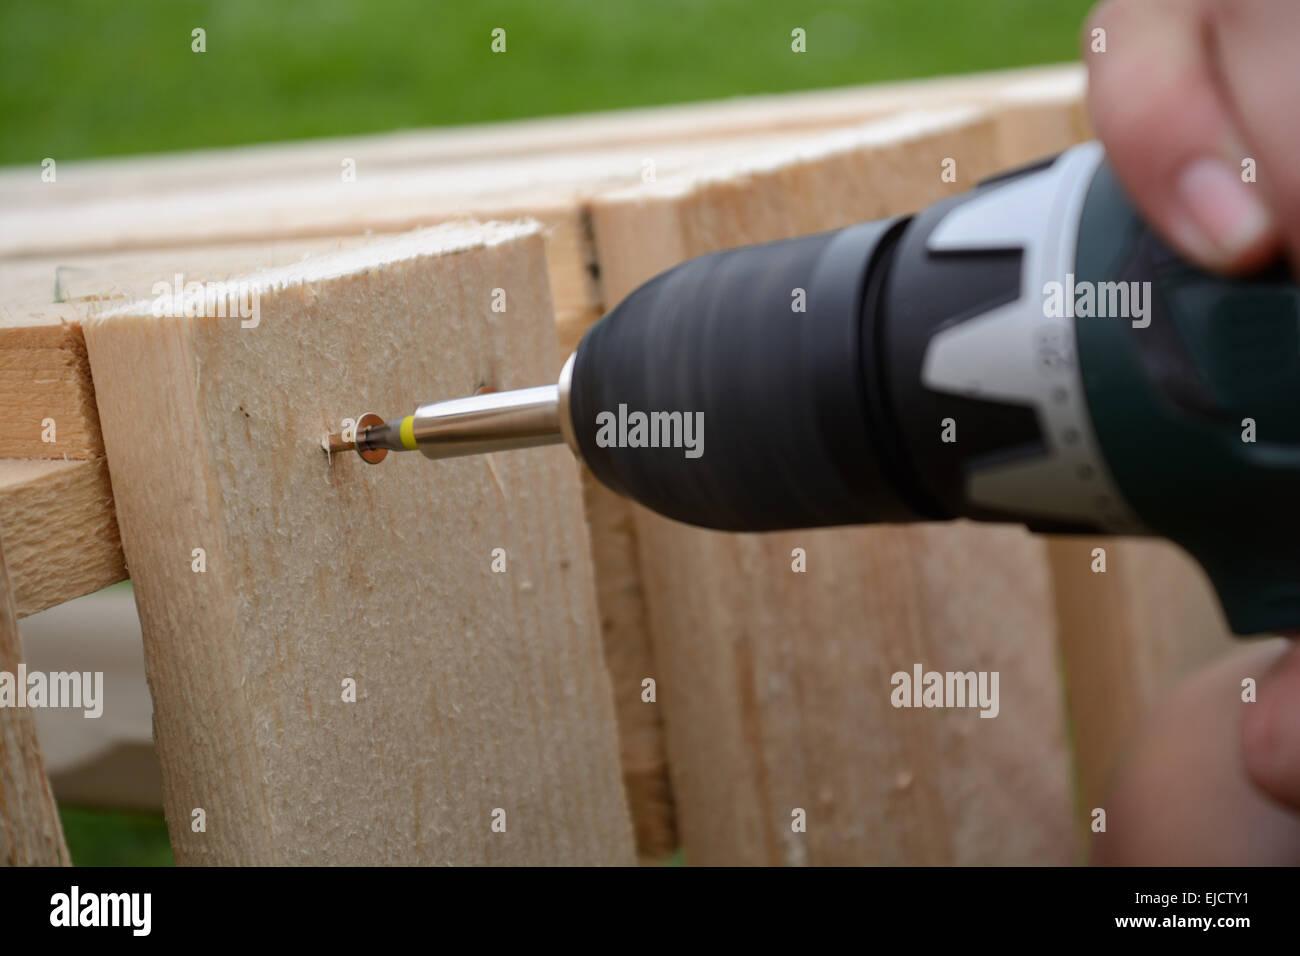 Carpenter screwed a Torx in wood - Stock Image